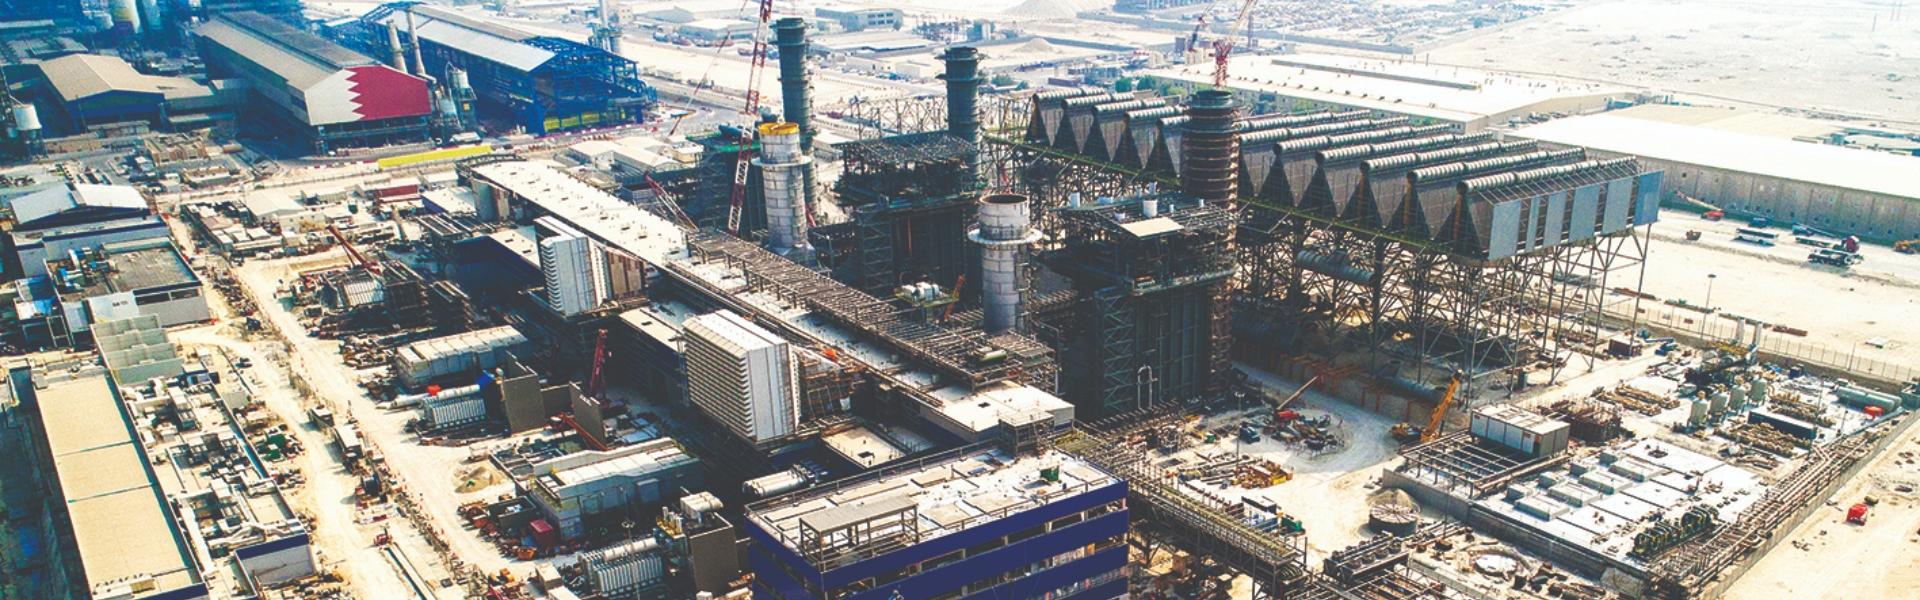 GAMA Holding | 1800 MW ALBA Line 6 Expansion, Power Station 5 |